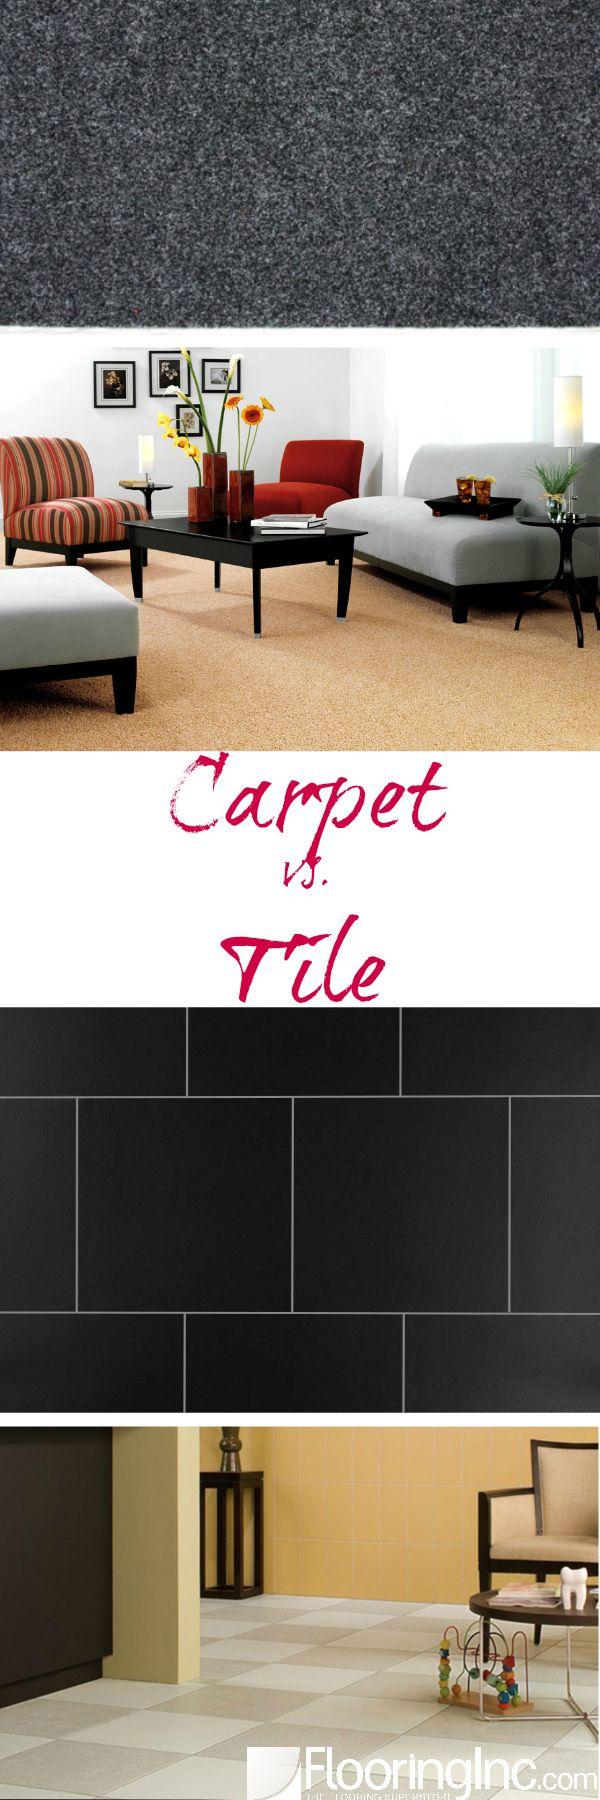 Harley color carpet tiles - Carpet Vs Tile